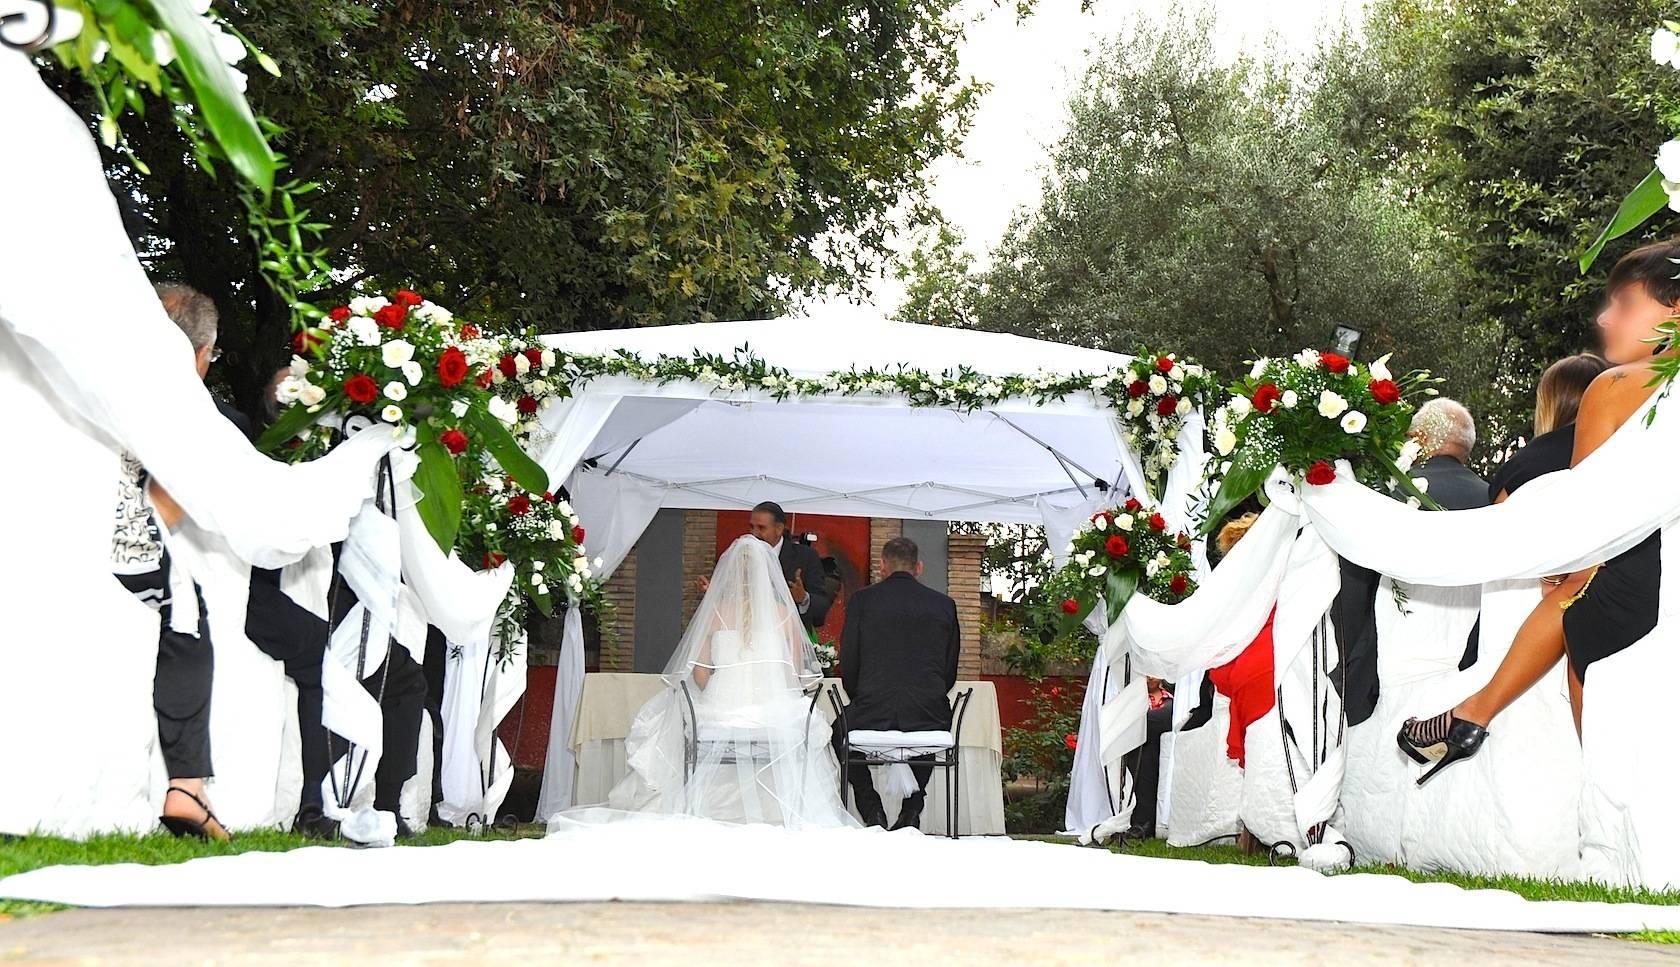 Celebrante Matrimonio Simbolico Roma : Matrimonio simbolico perchè scegliere un celebrante professionista